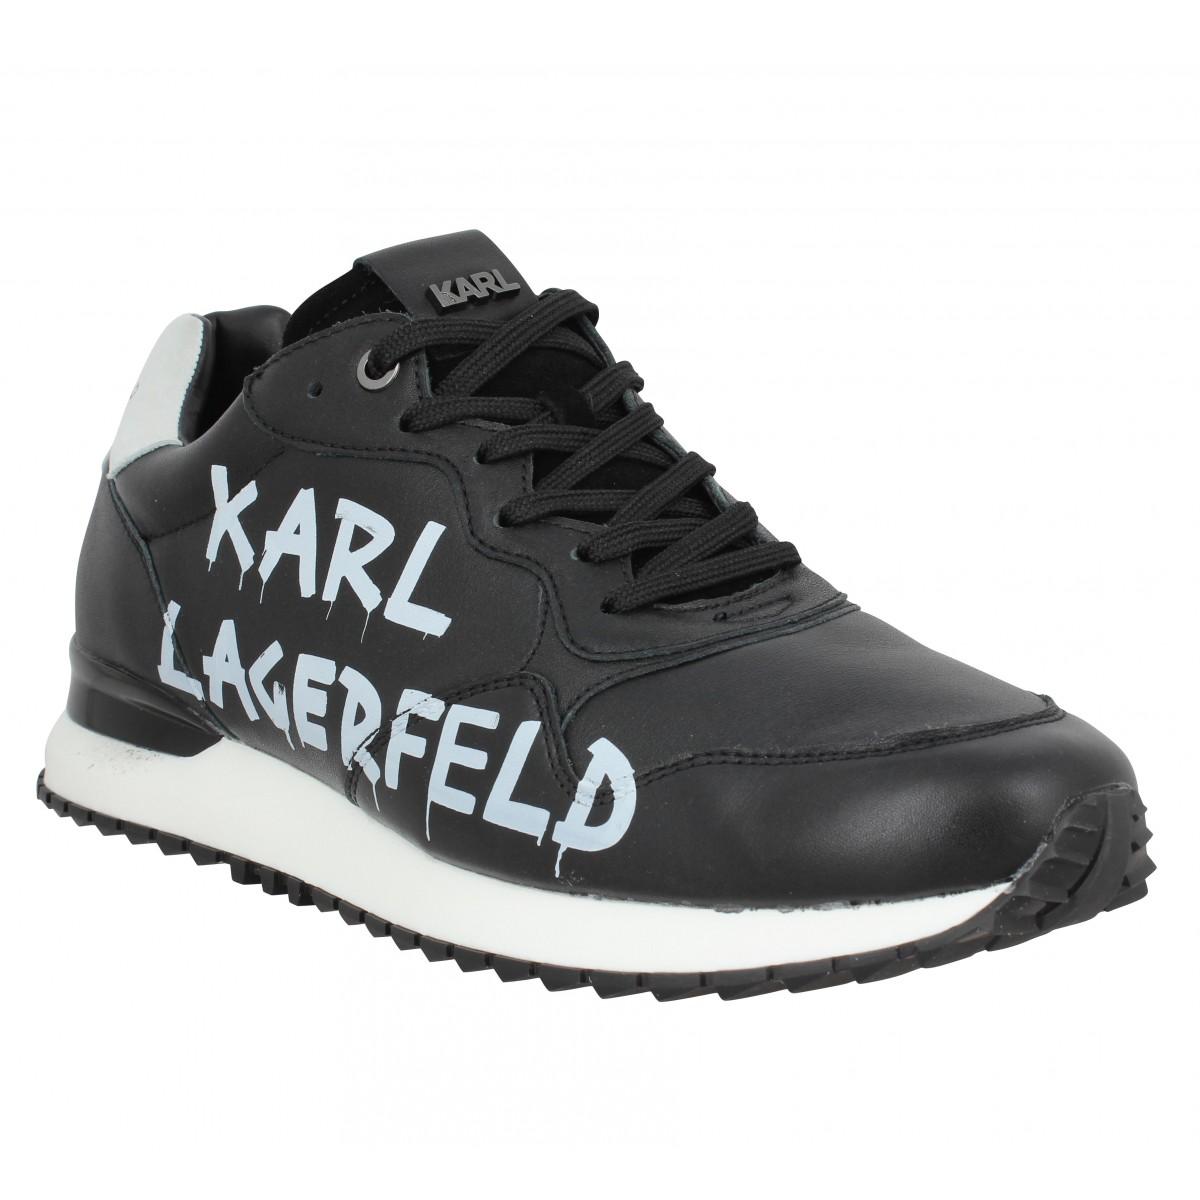 Karl Lagerfeld Homme Velocitor Meteor...